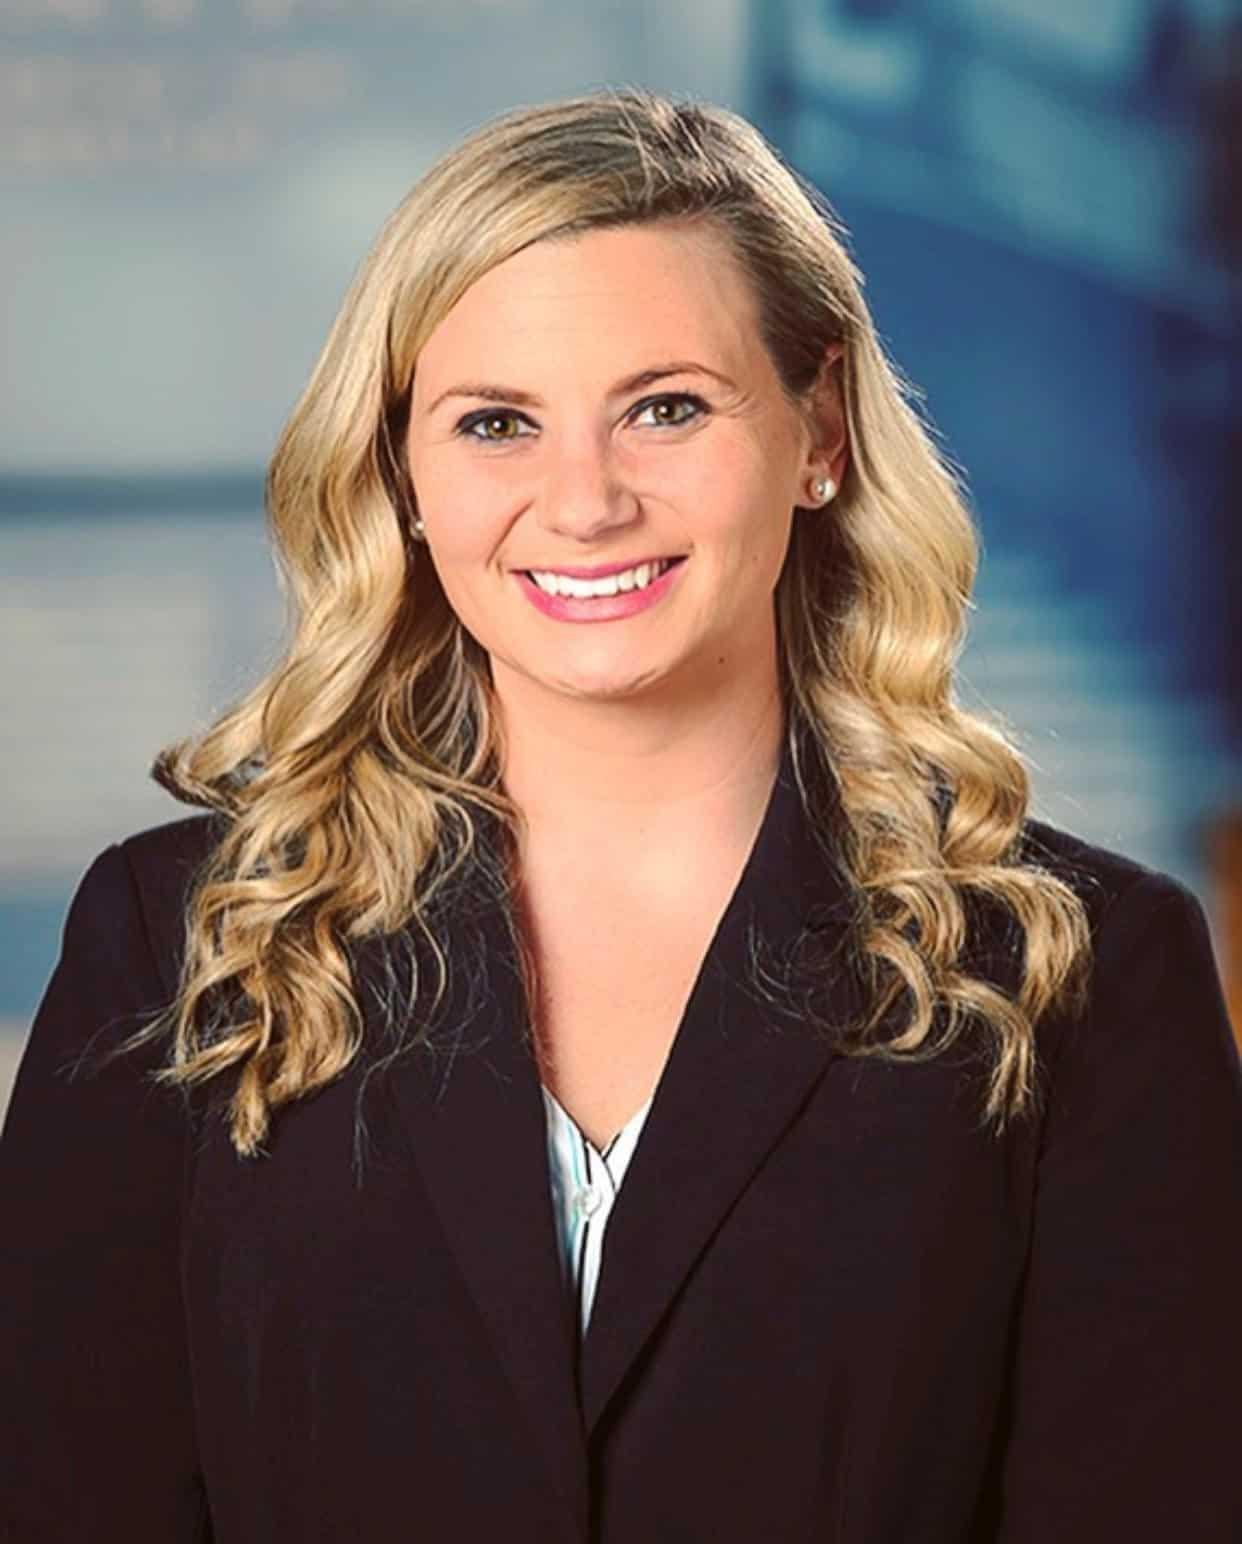 Kaitlynn Jessup